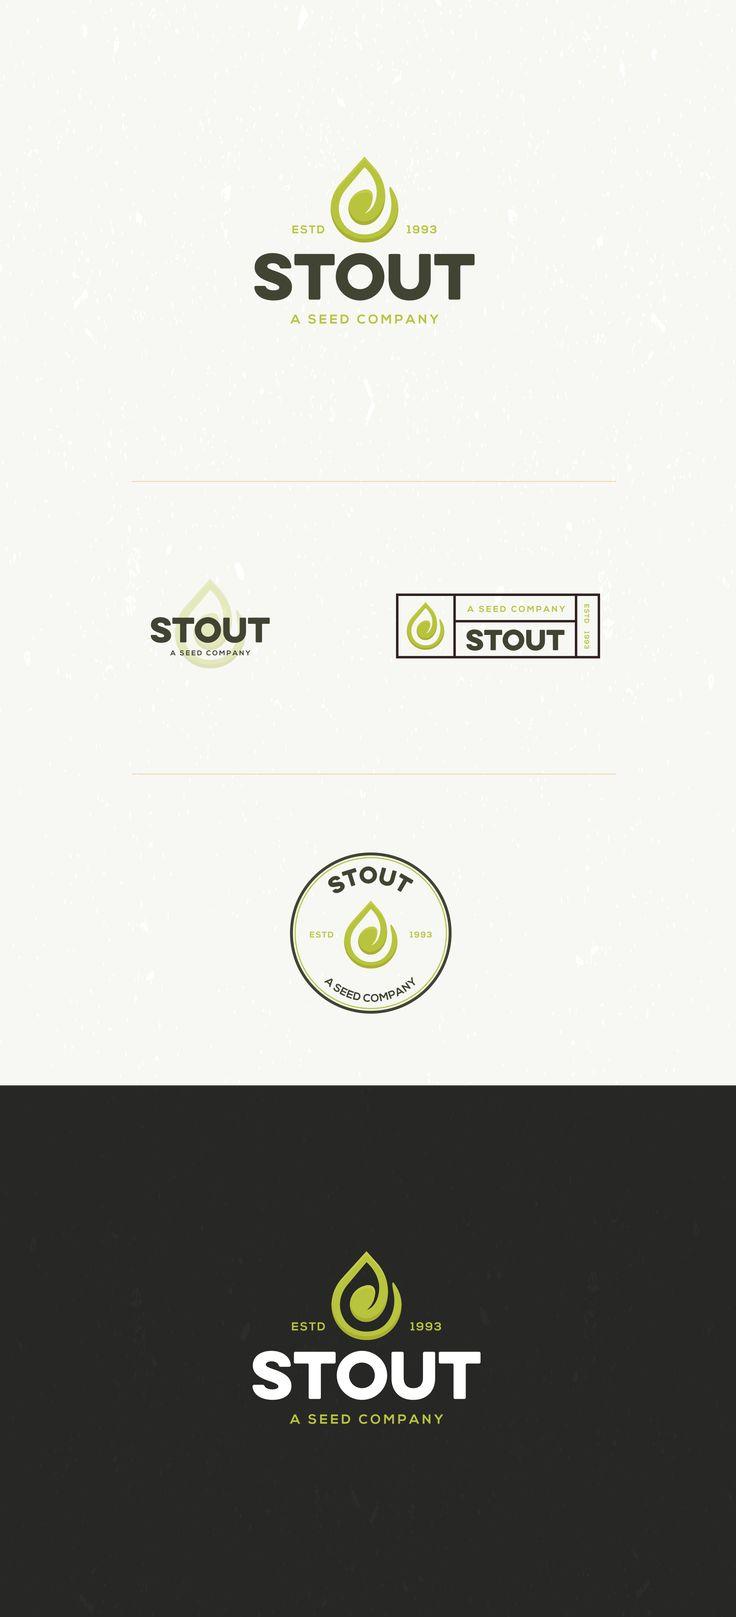 Designs | Create a logo for a cutting edge seed company | Logo design contest